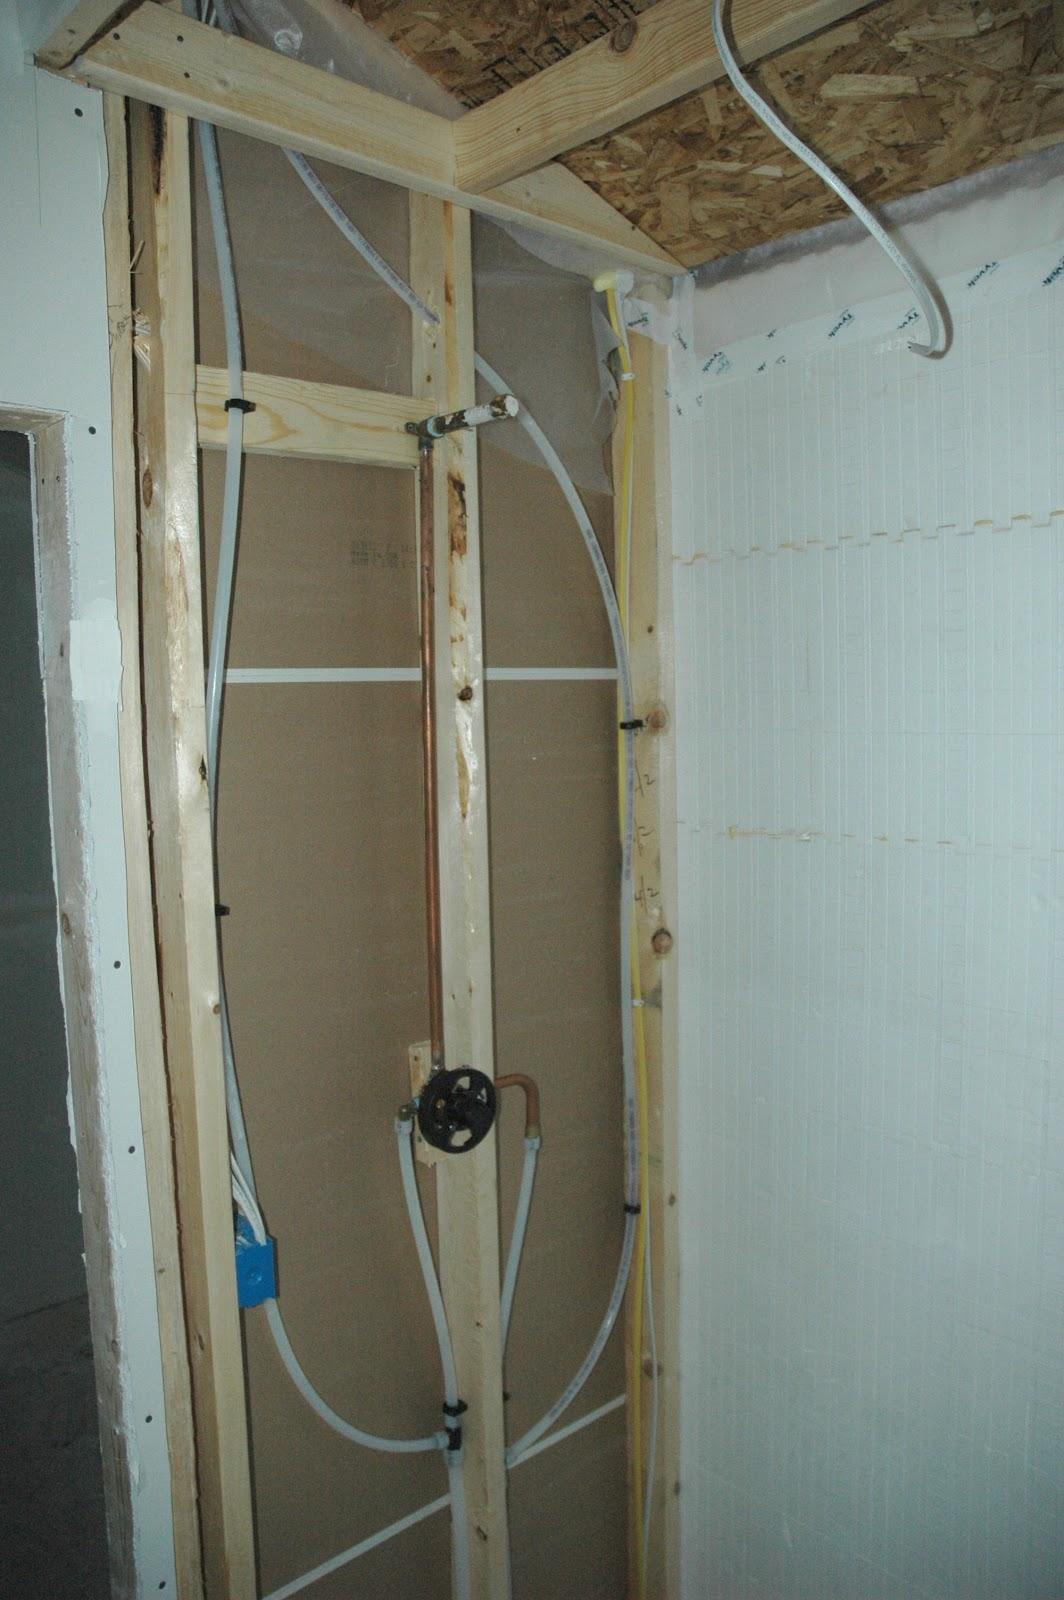 David S Icf Home Build Plumbing Status